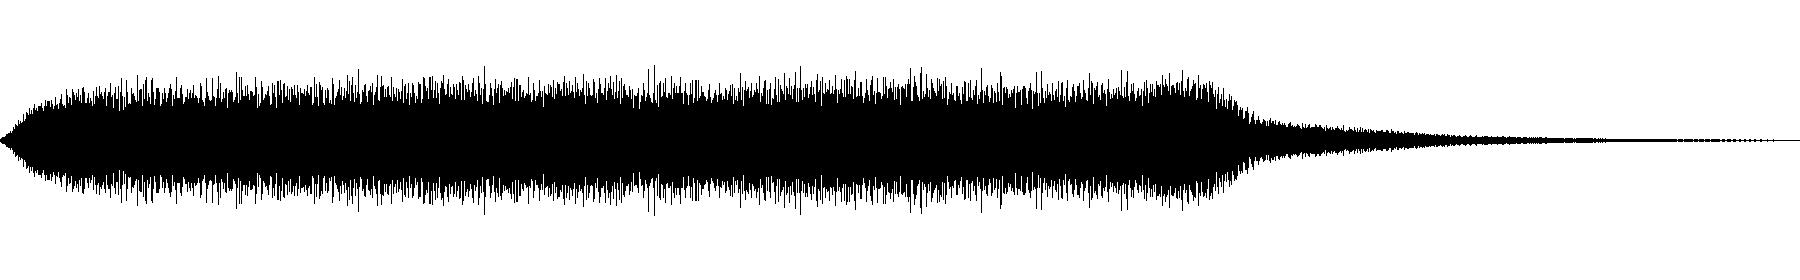 organ a7